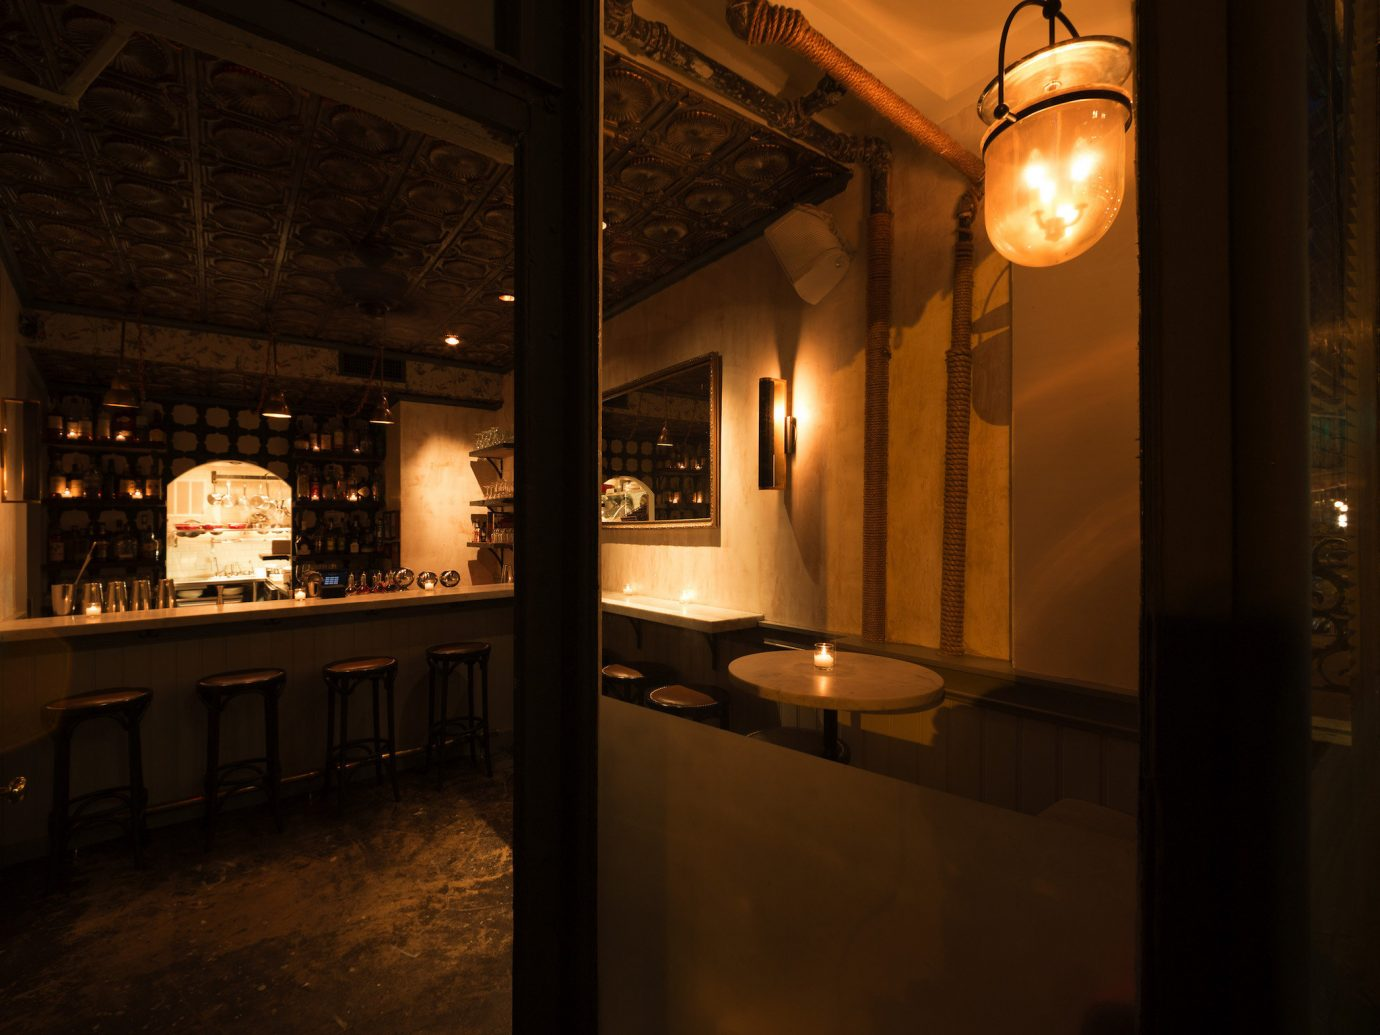 Food + Drink Romance indoor room lighting estate interior design restaurant home Bar Design night lit light